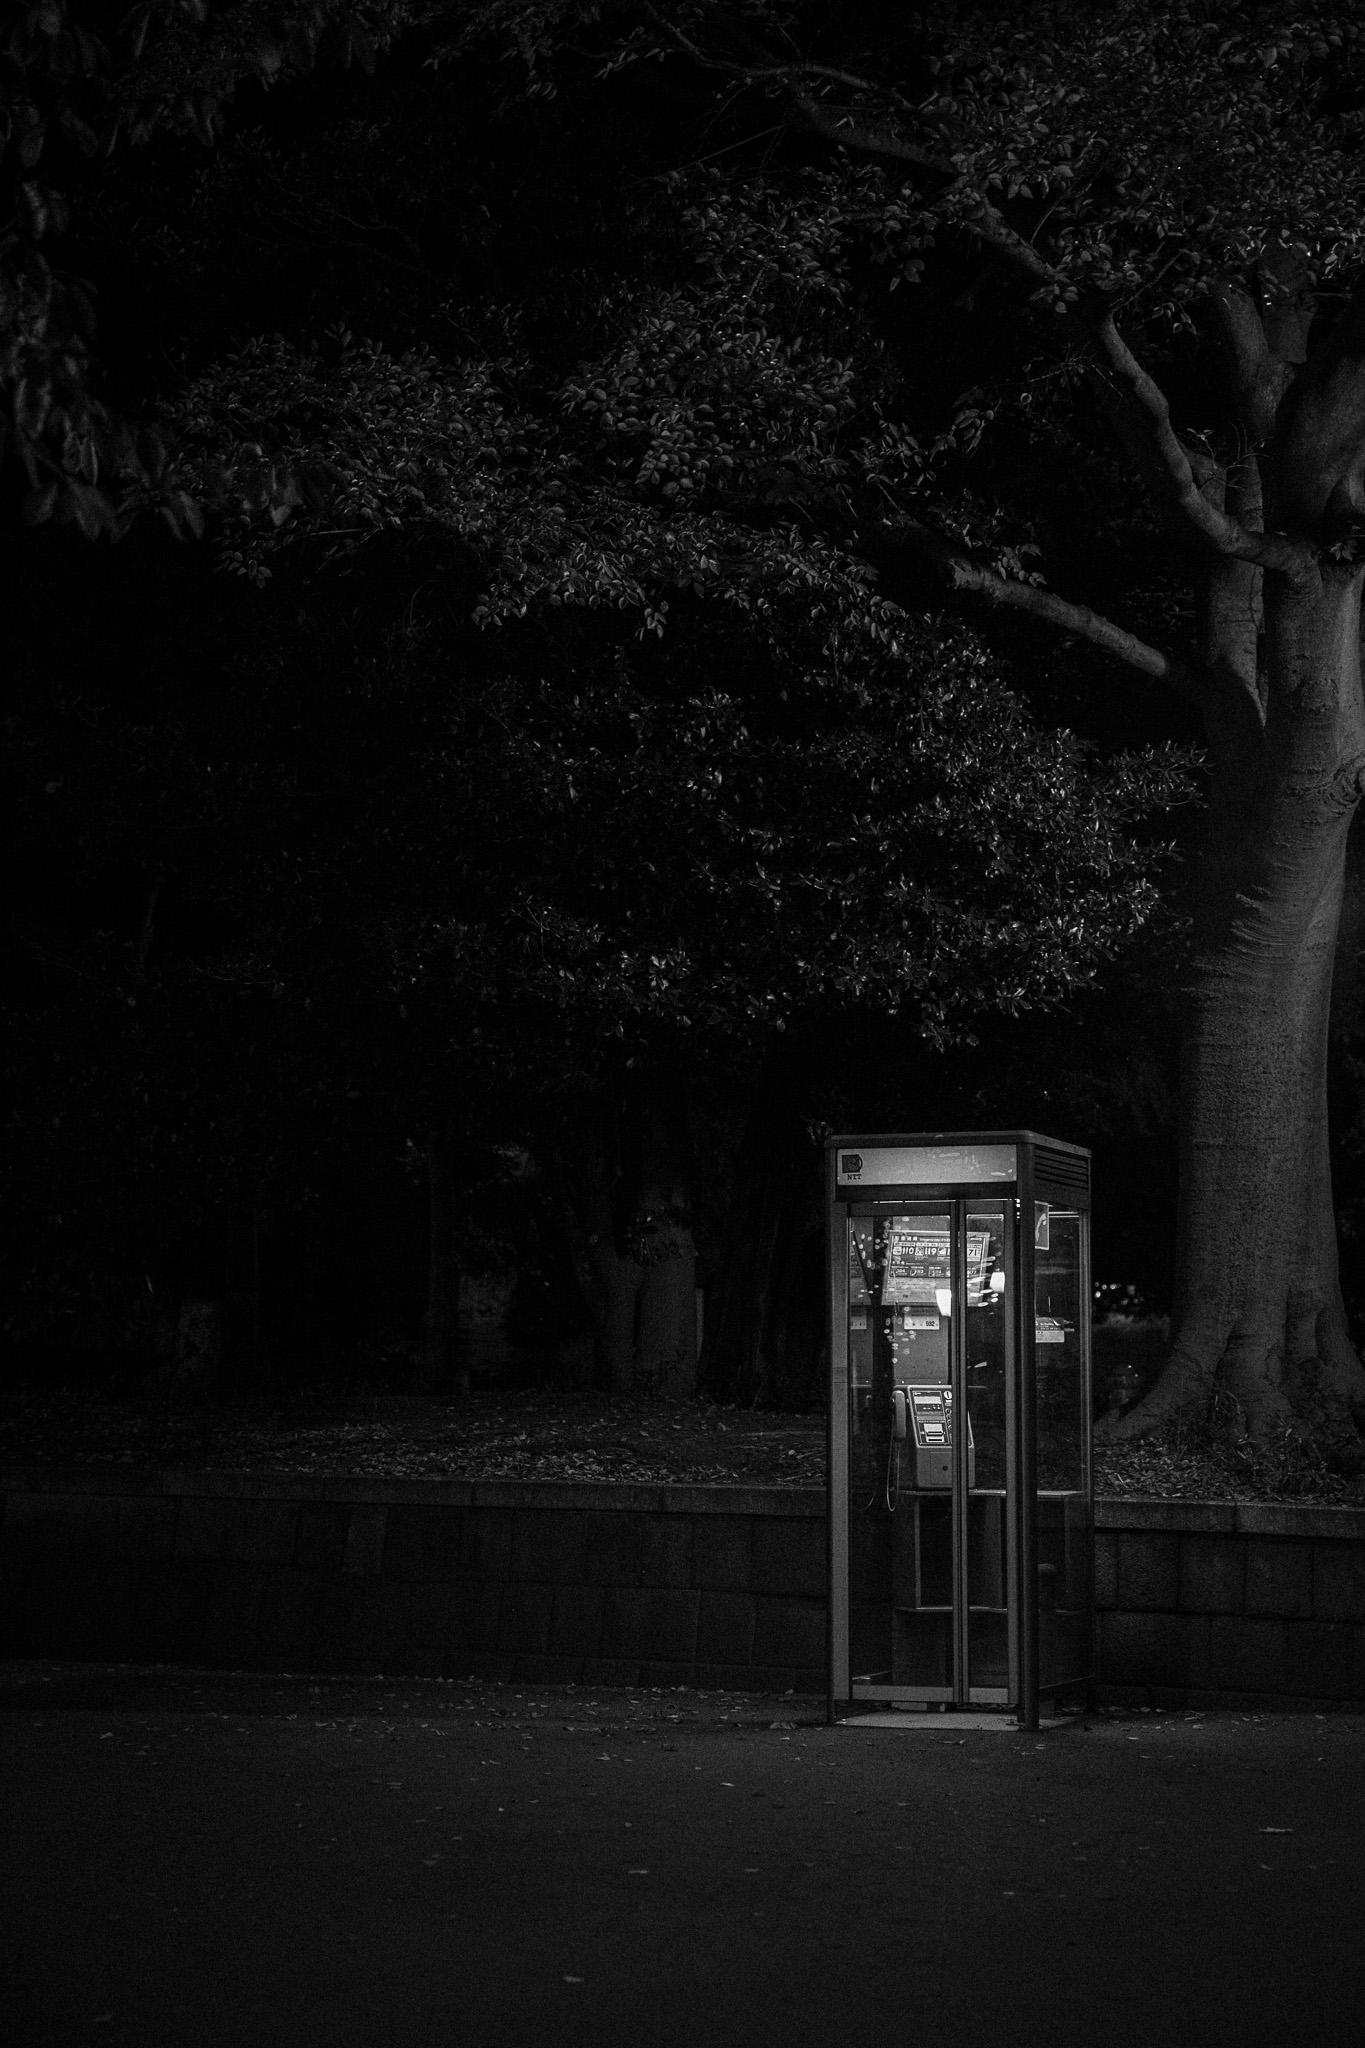 Telephone Box in Ueno Park, Tokyo Japan